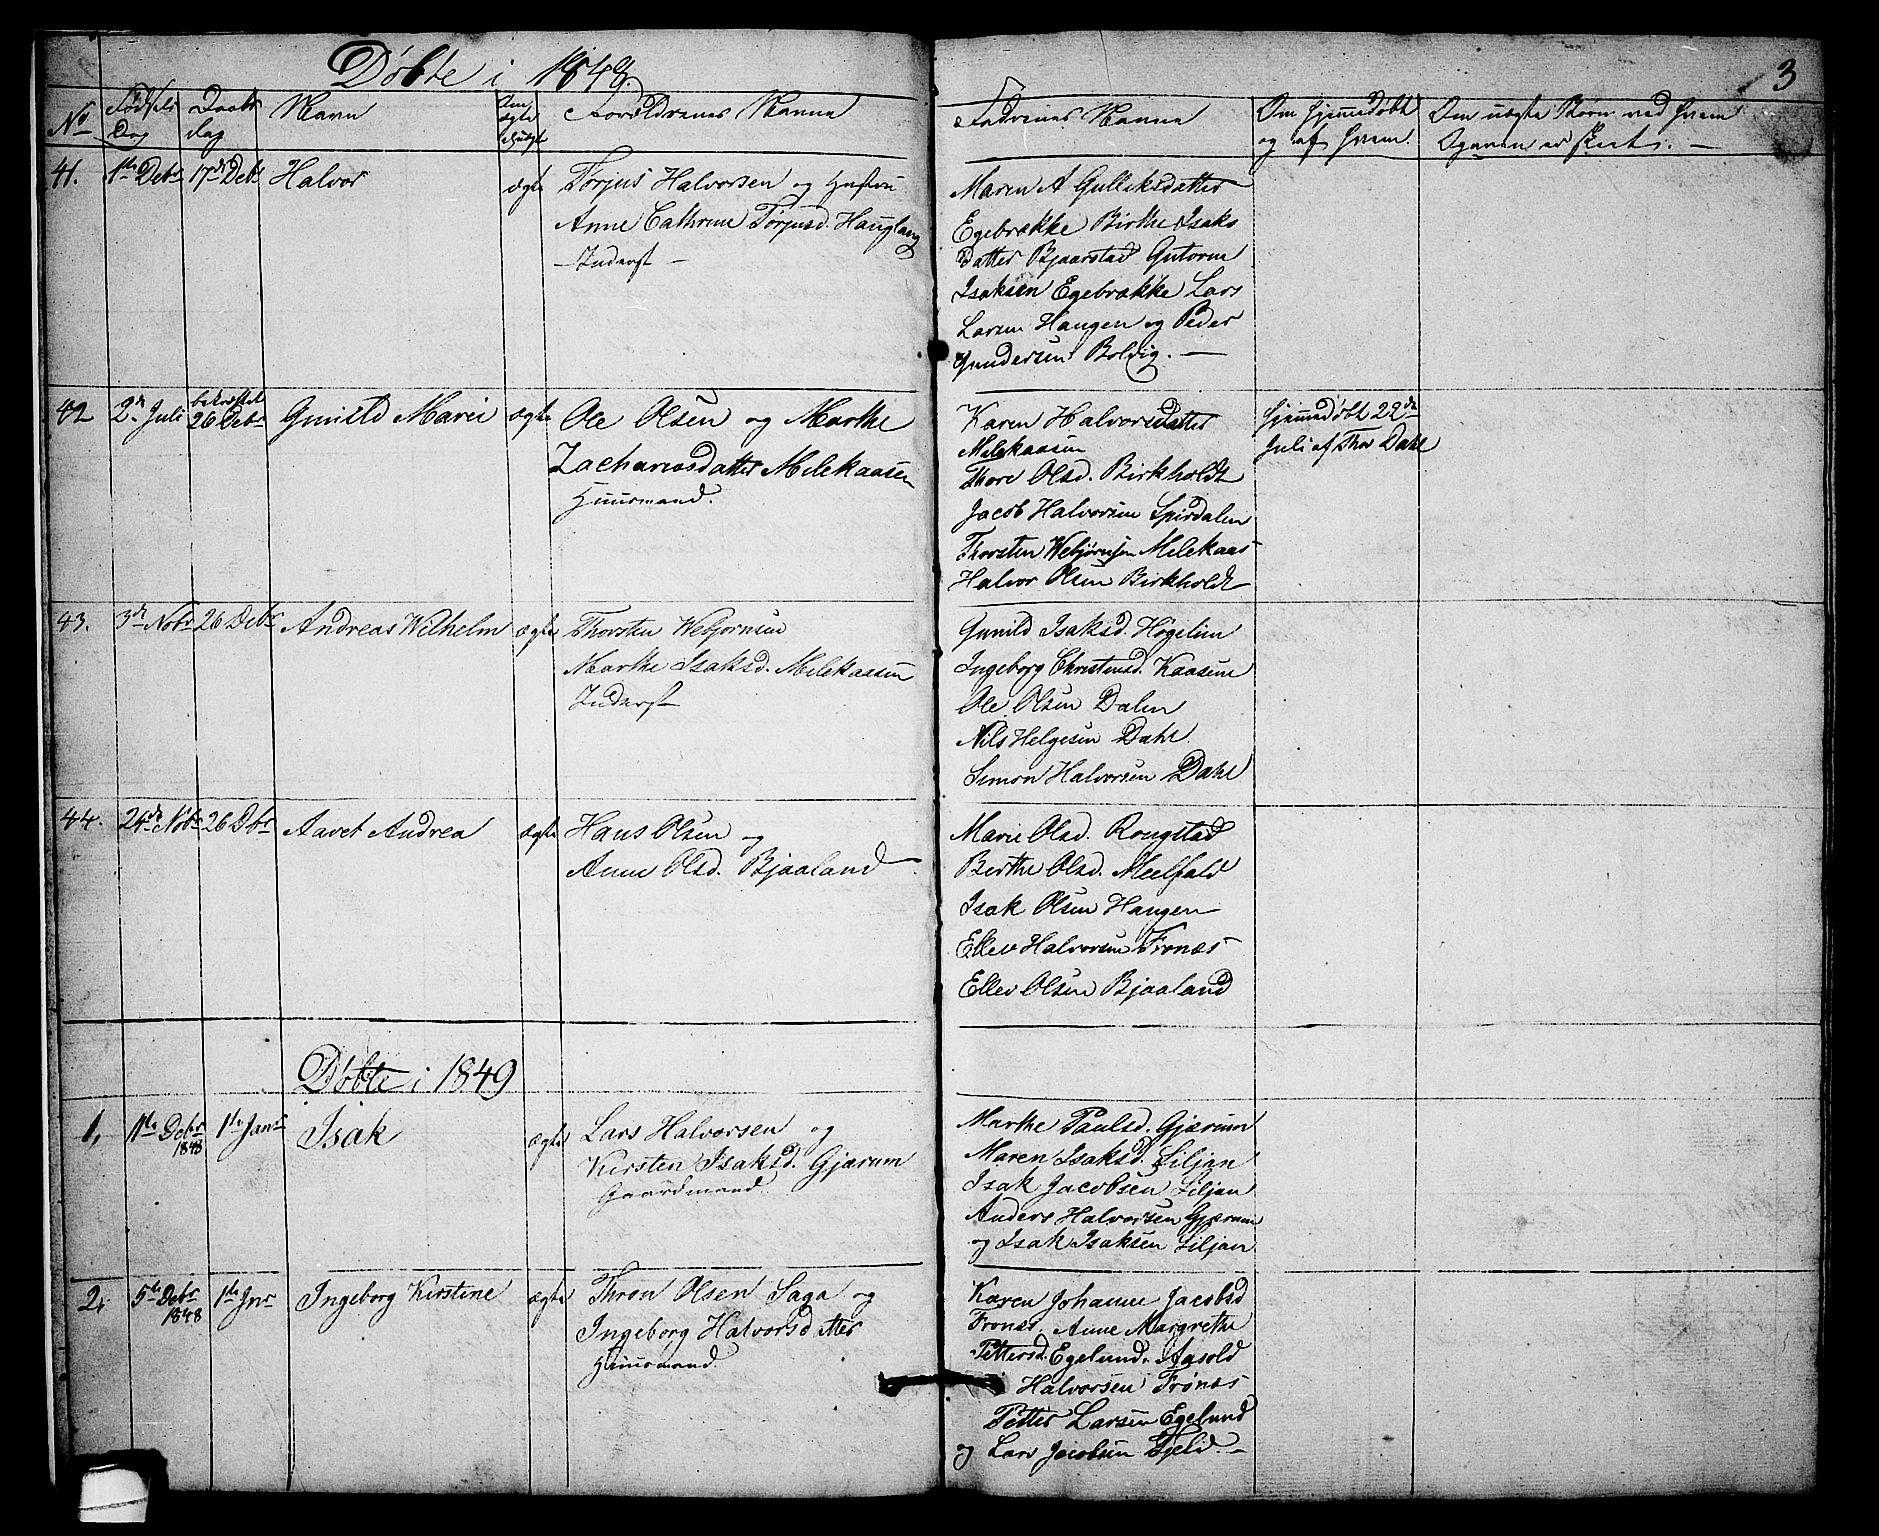 SAKO, Solum kirkebøker, G/Gb/L0001: Klokkerbok nr. II 1, 1848-1859, s. 3